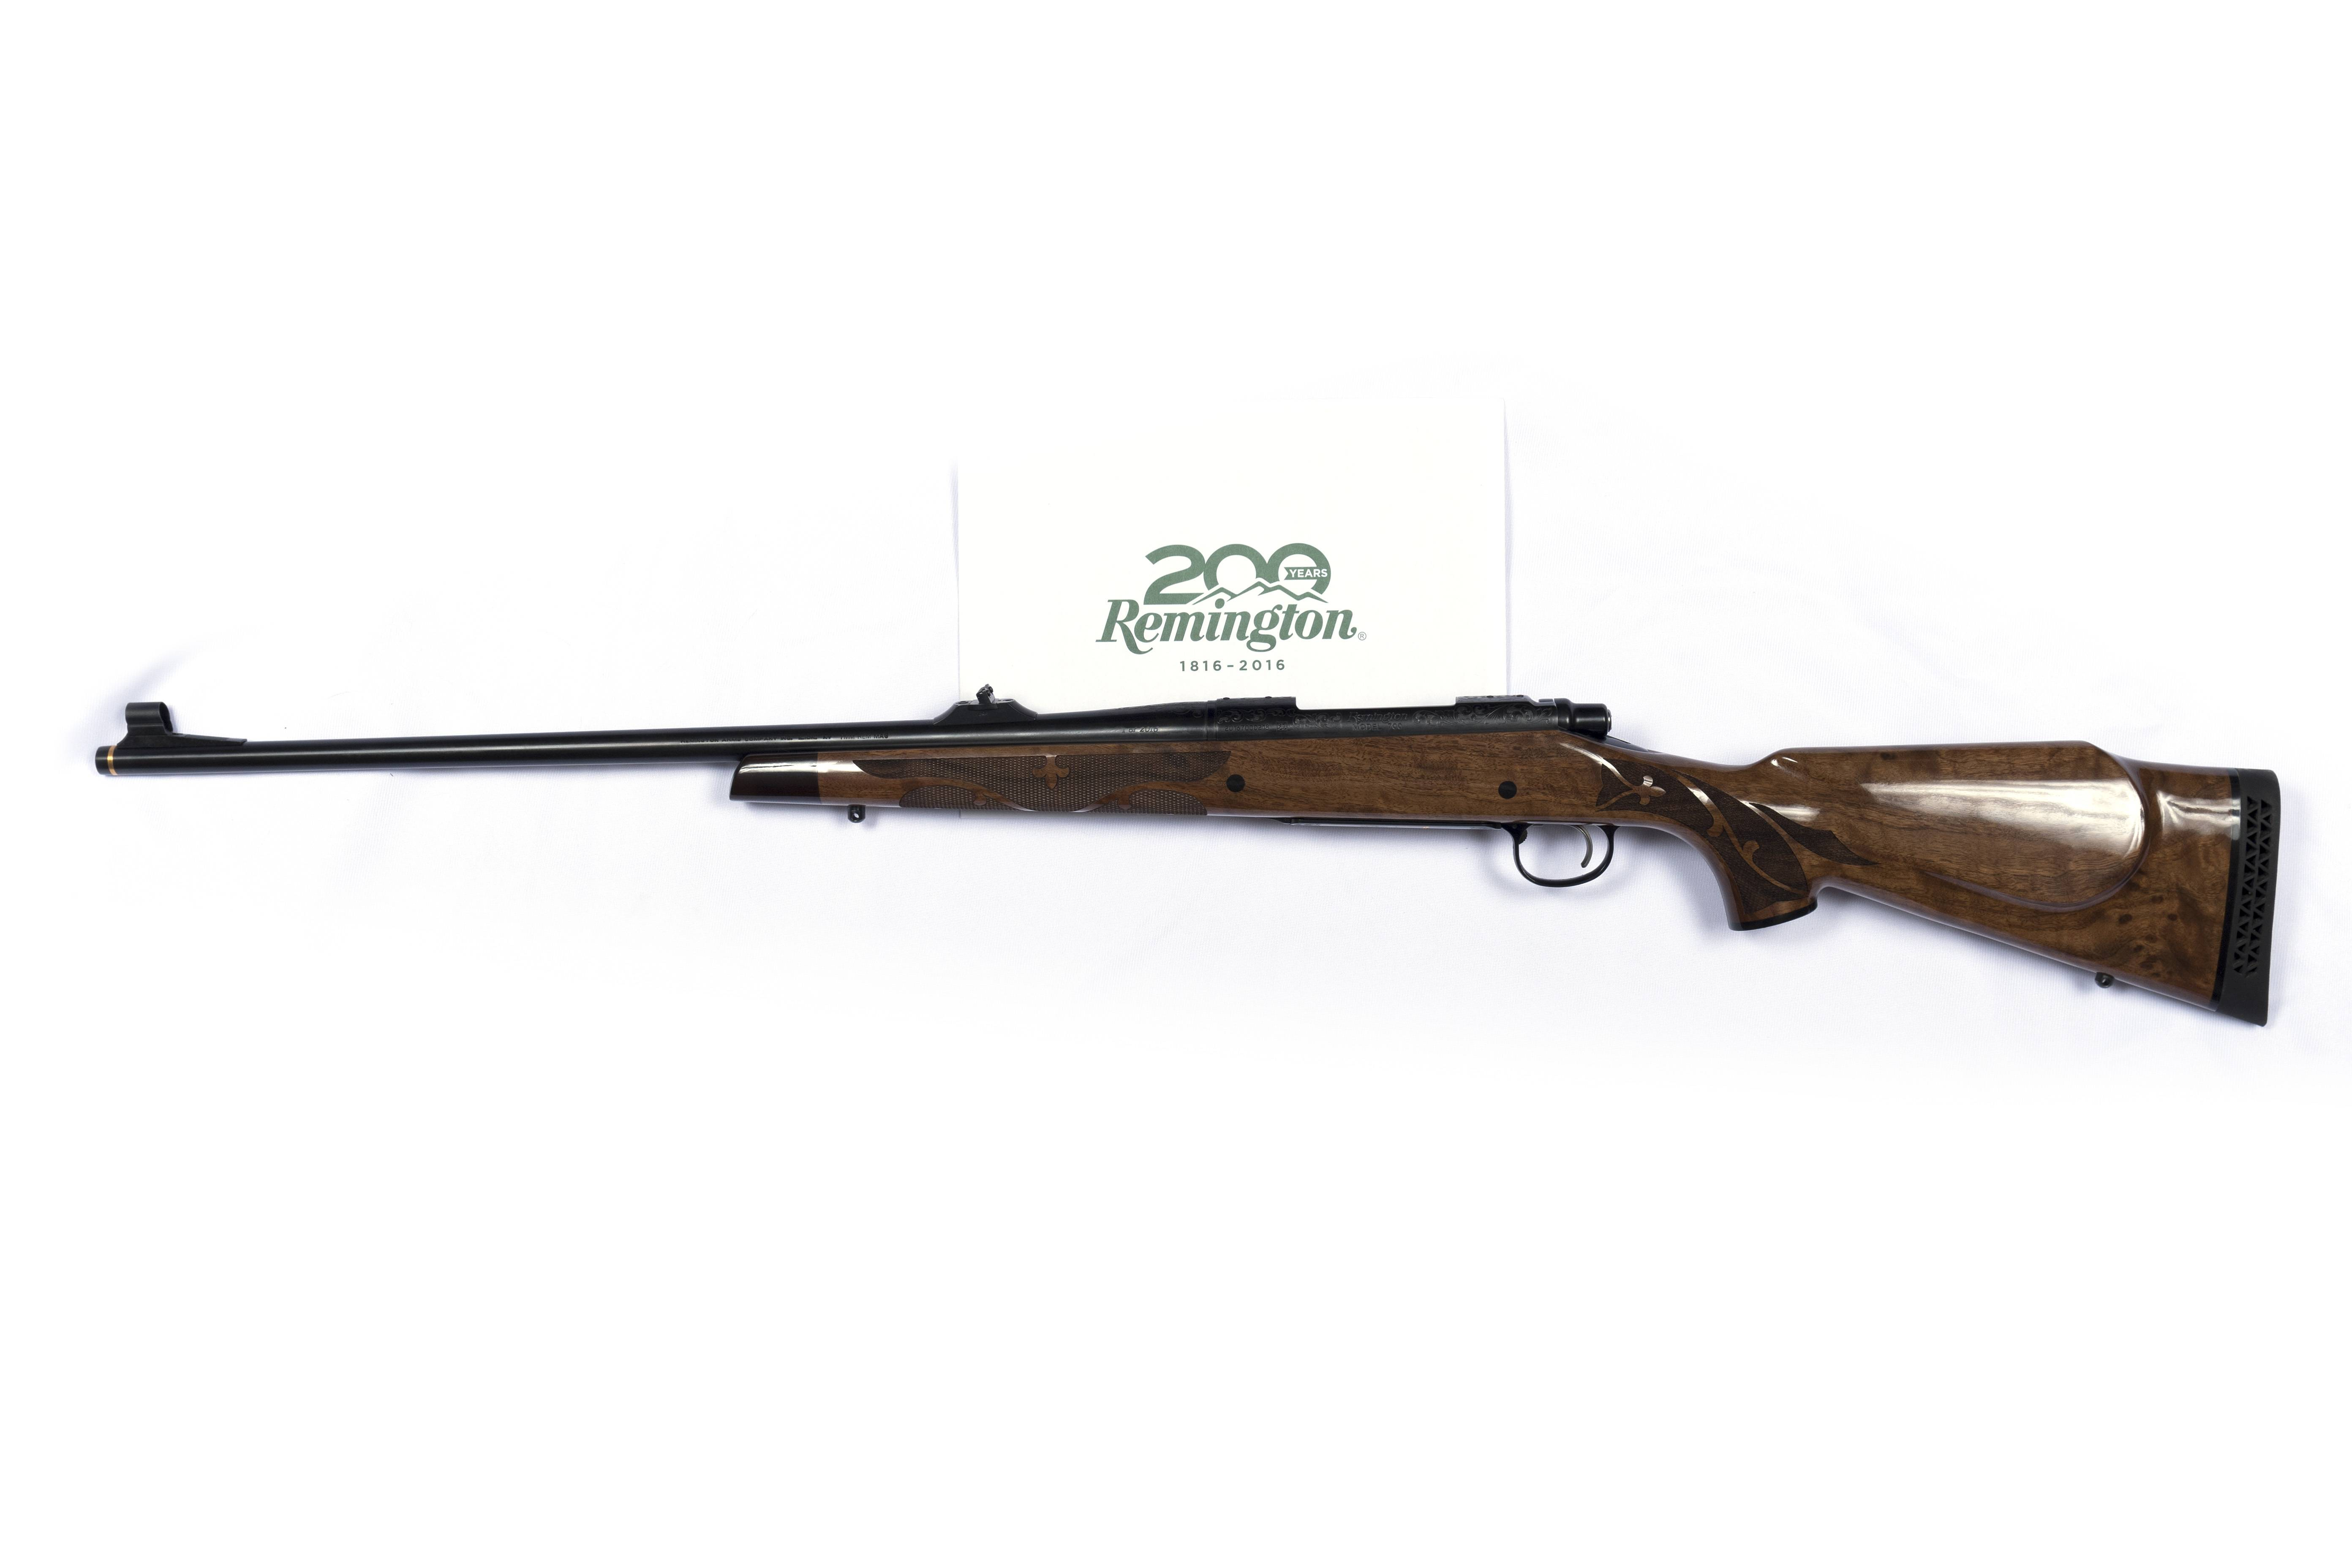 Serial remington list 700 number Remington Serial